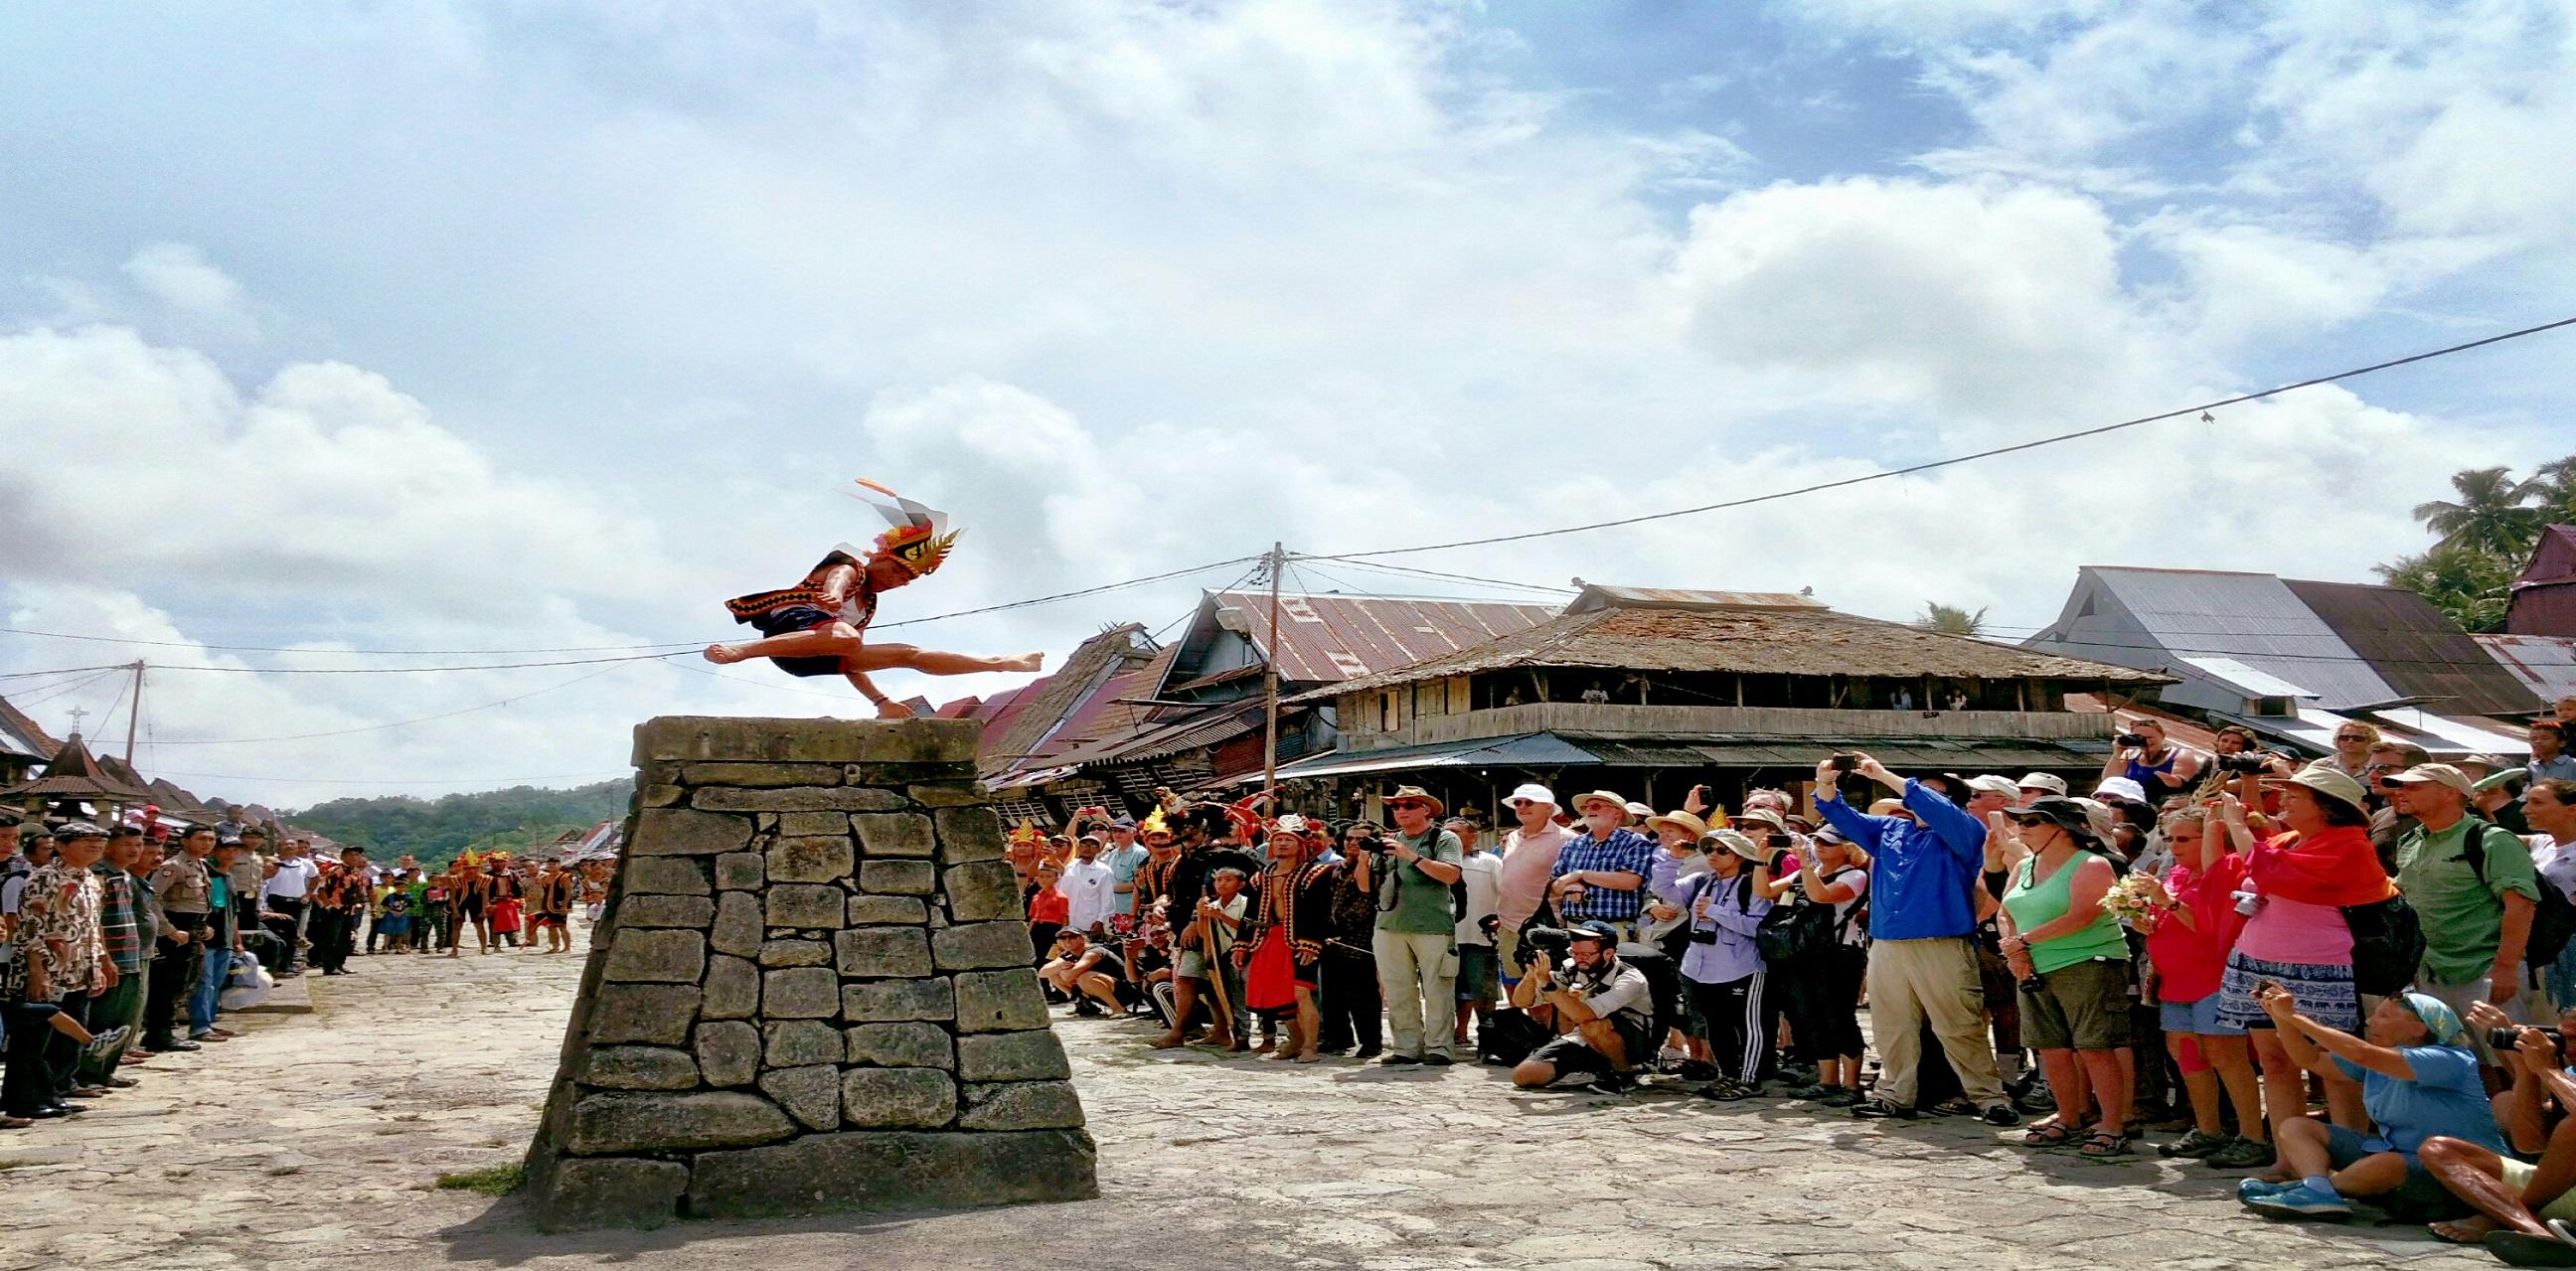 Tradisi Hombo Batu sebagai Salah Satu Tradisi yang Terkenal di Nias